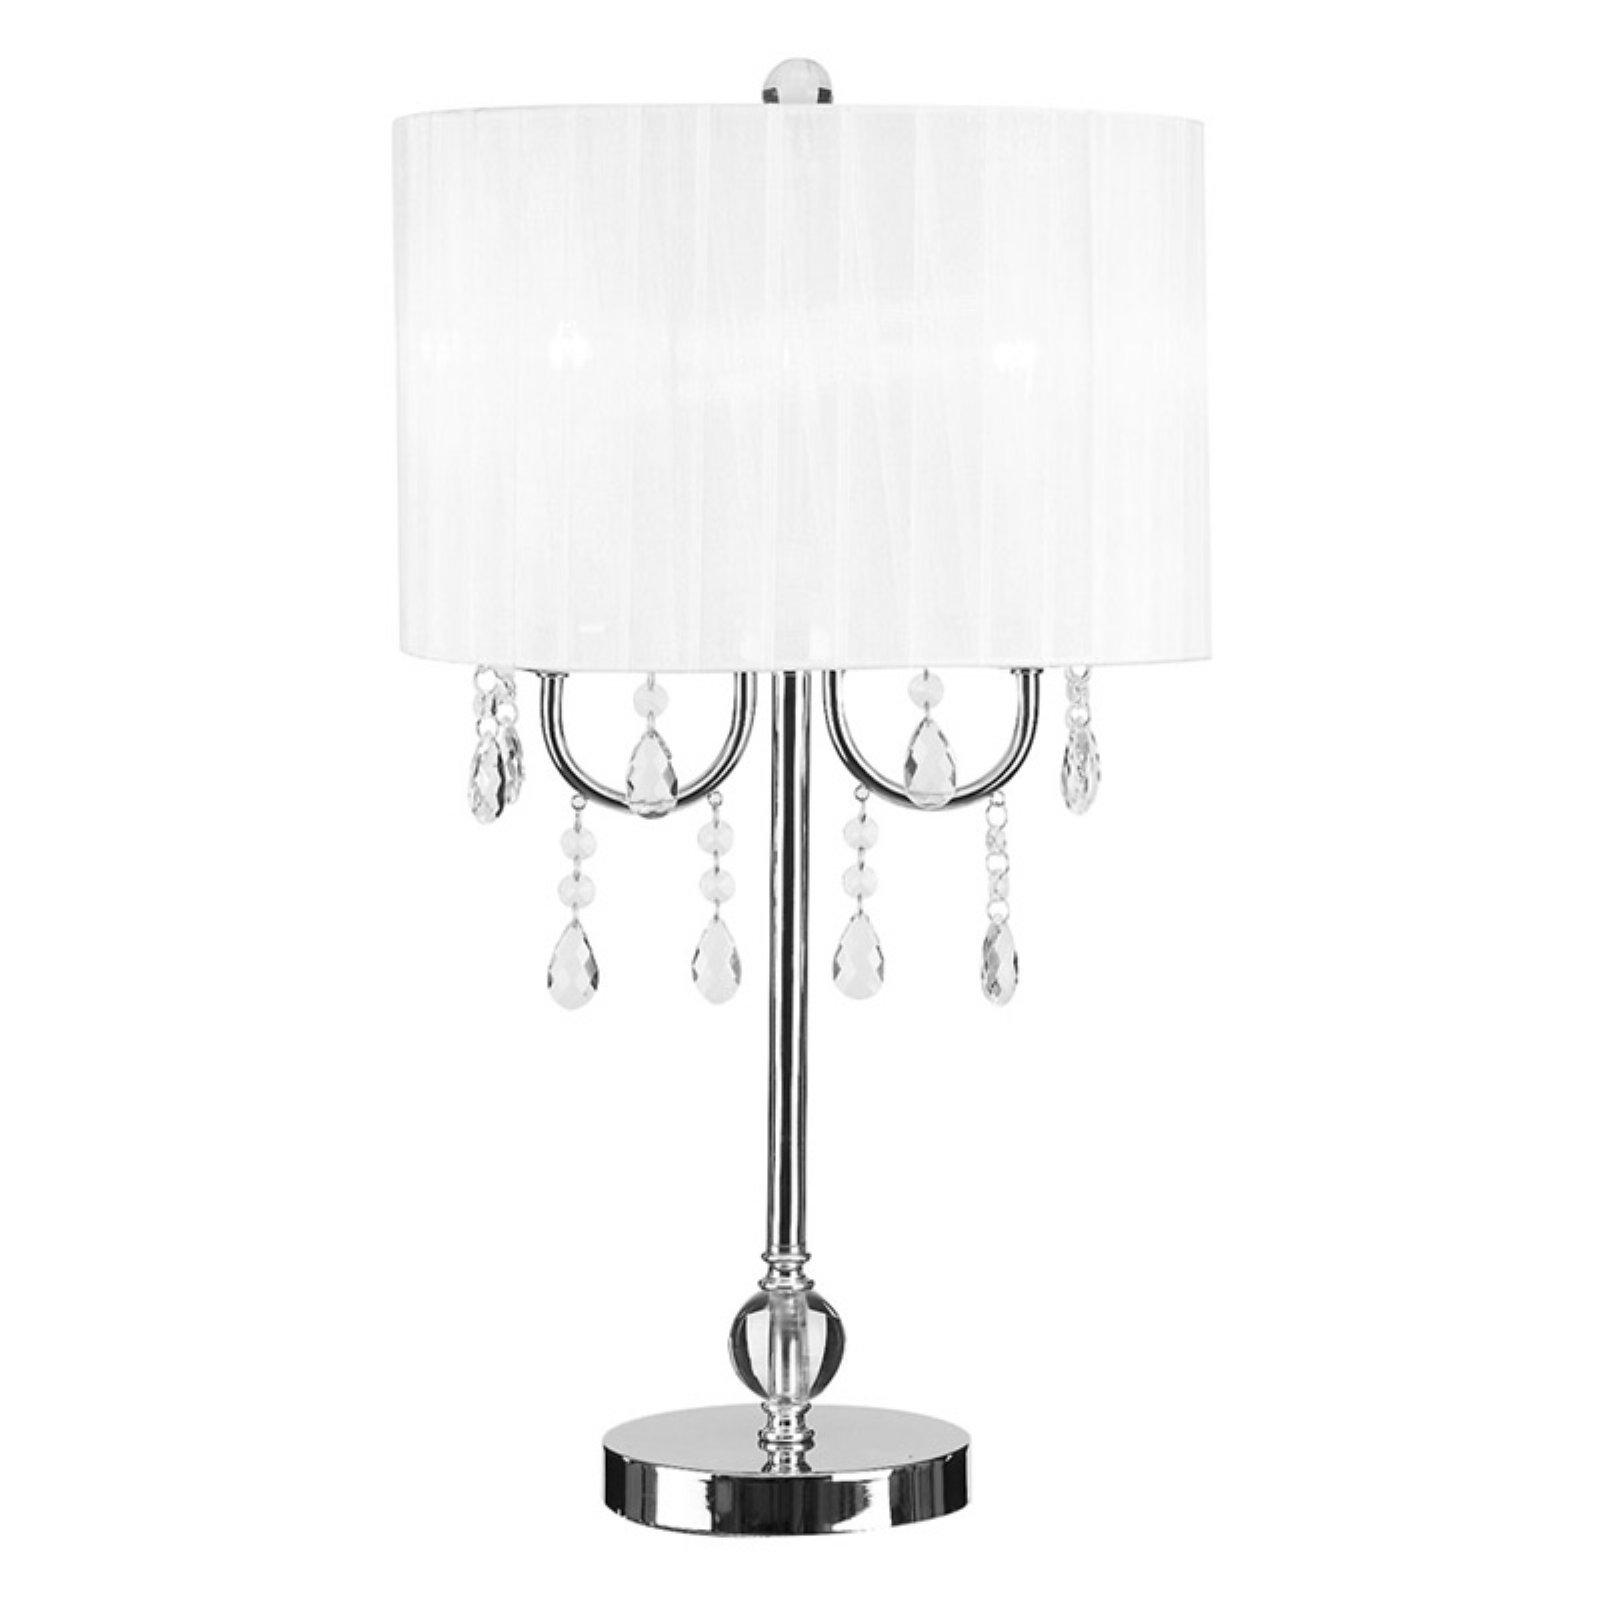 Cresswell Lighting Chandelier Table Lamp Walmart Com